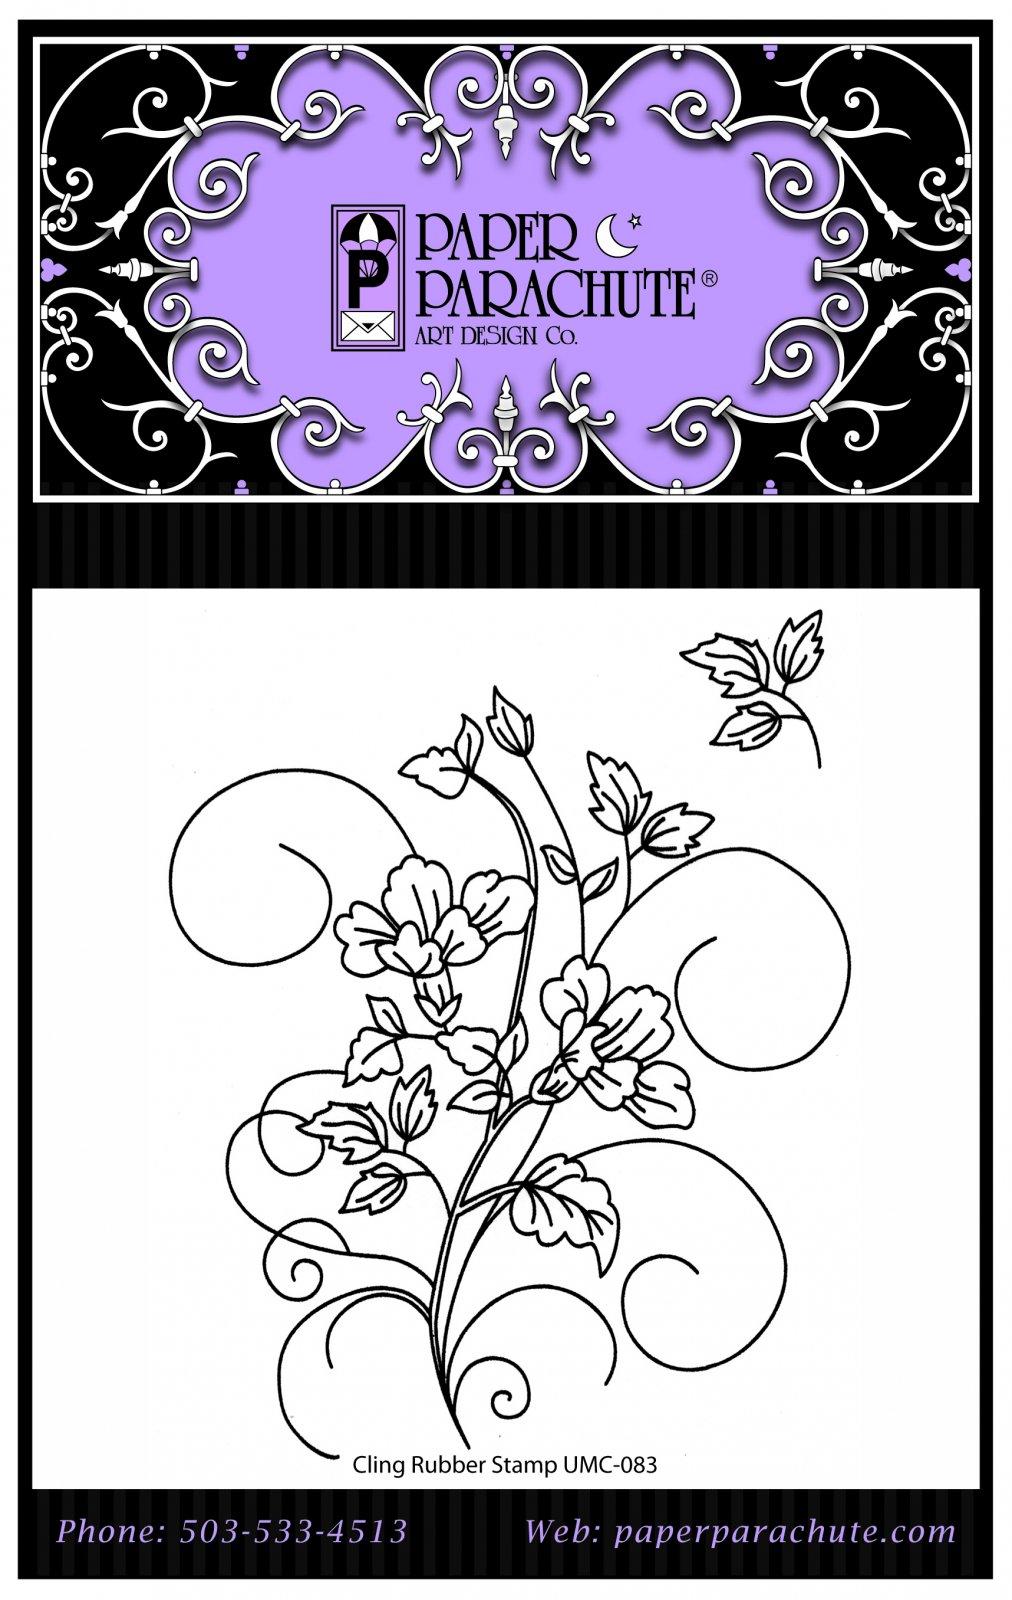 Paper Parachute Rubber Stamp Set - UMC083